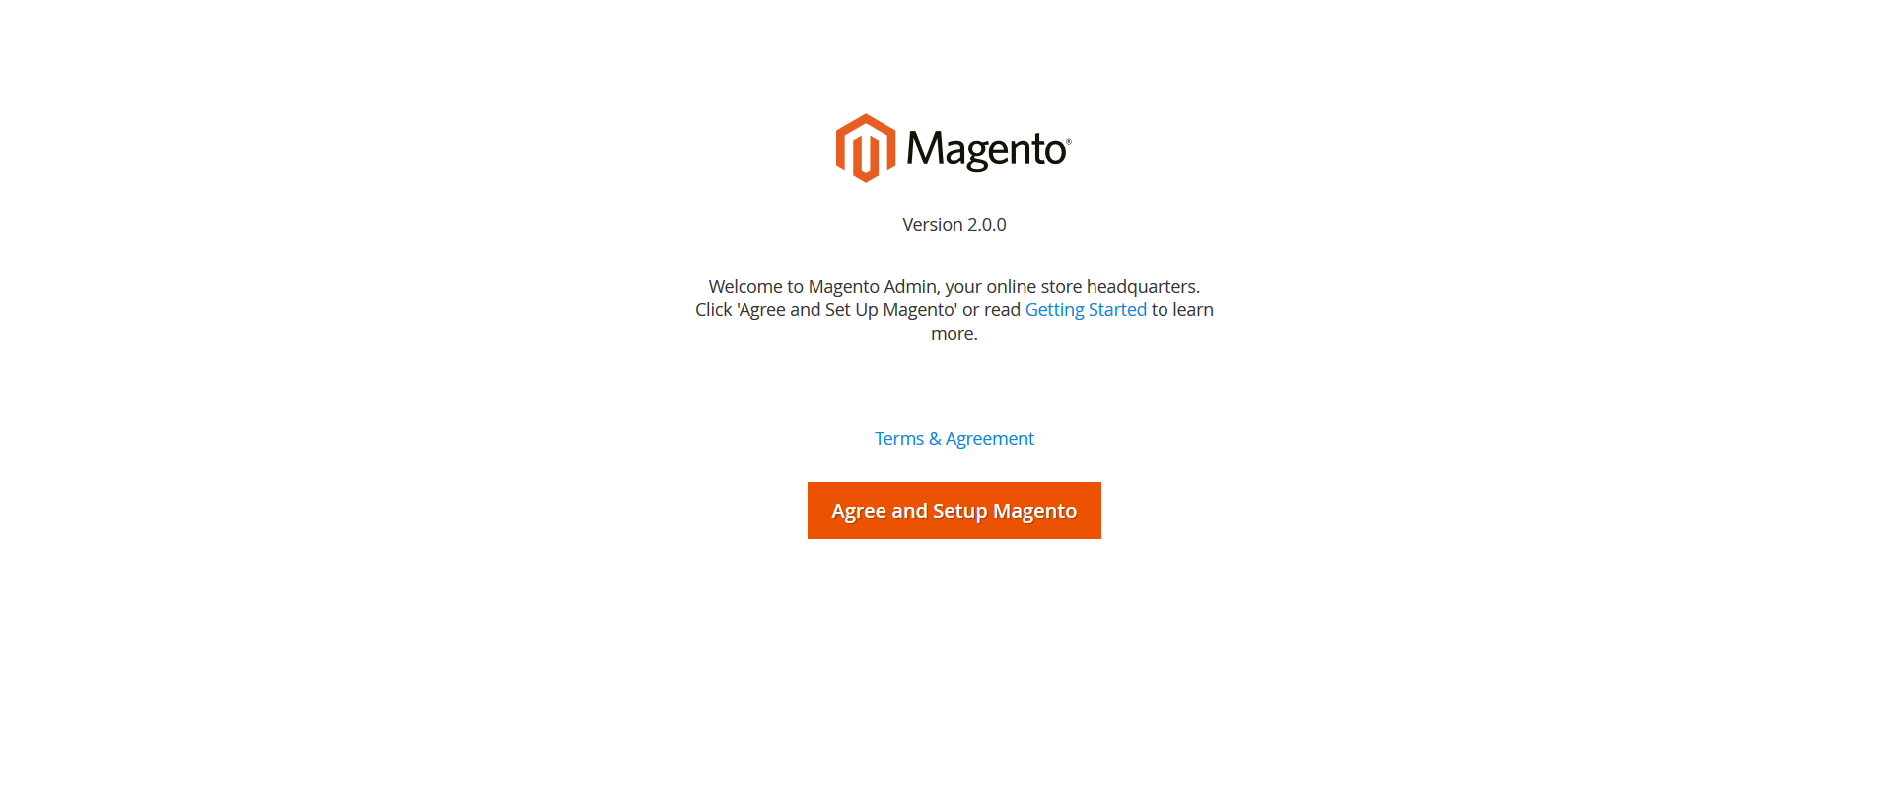 I will install and setup Magento 2